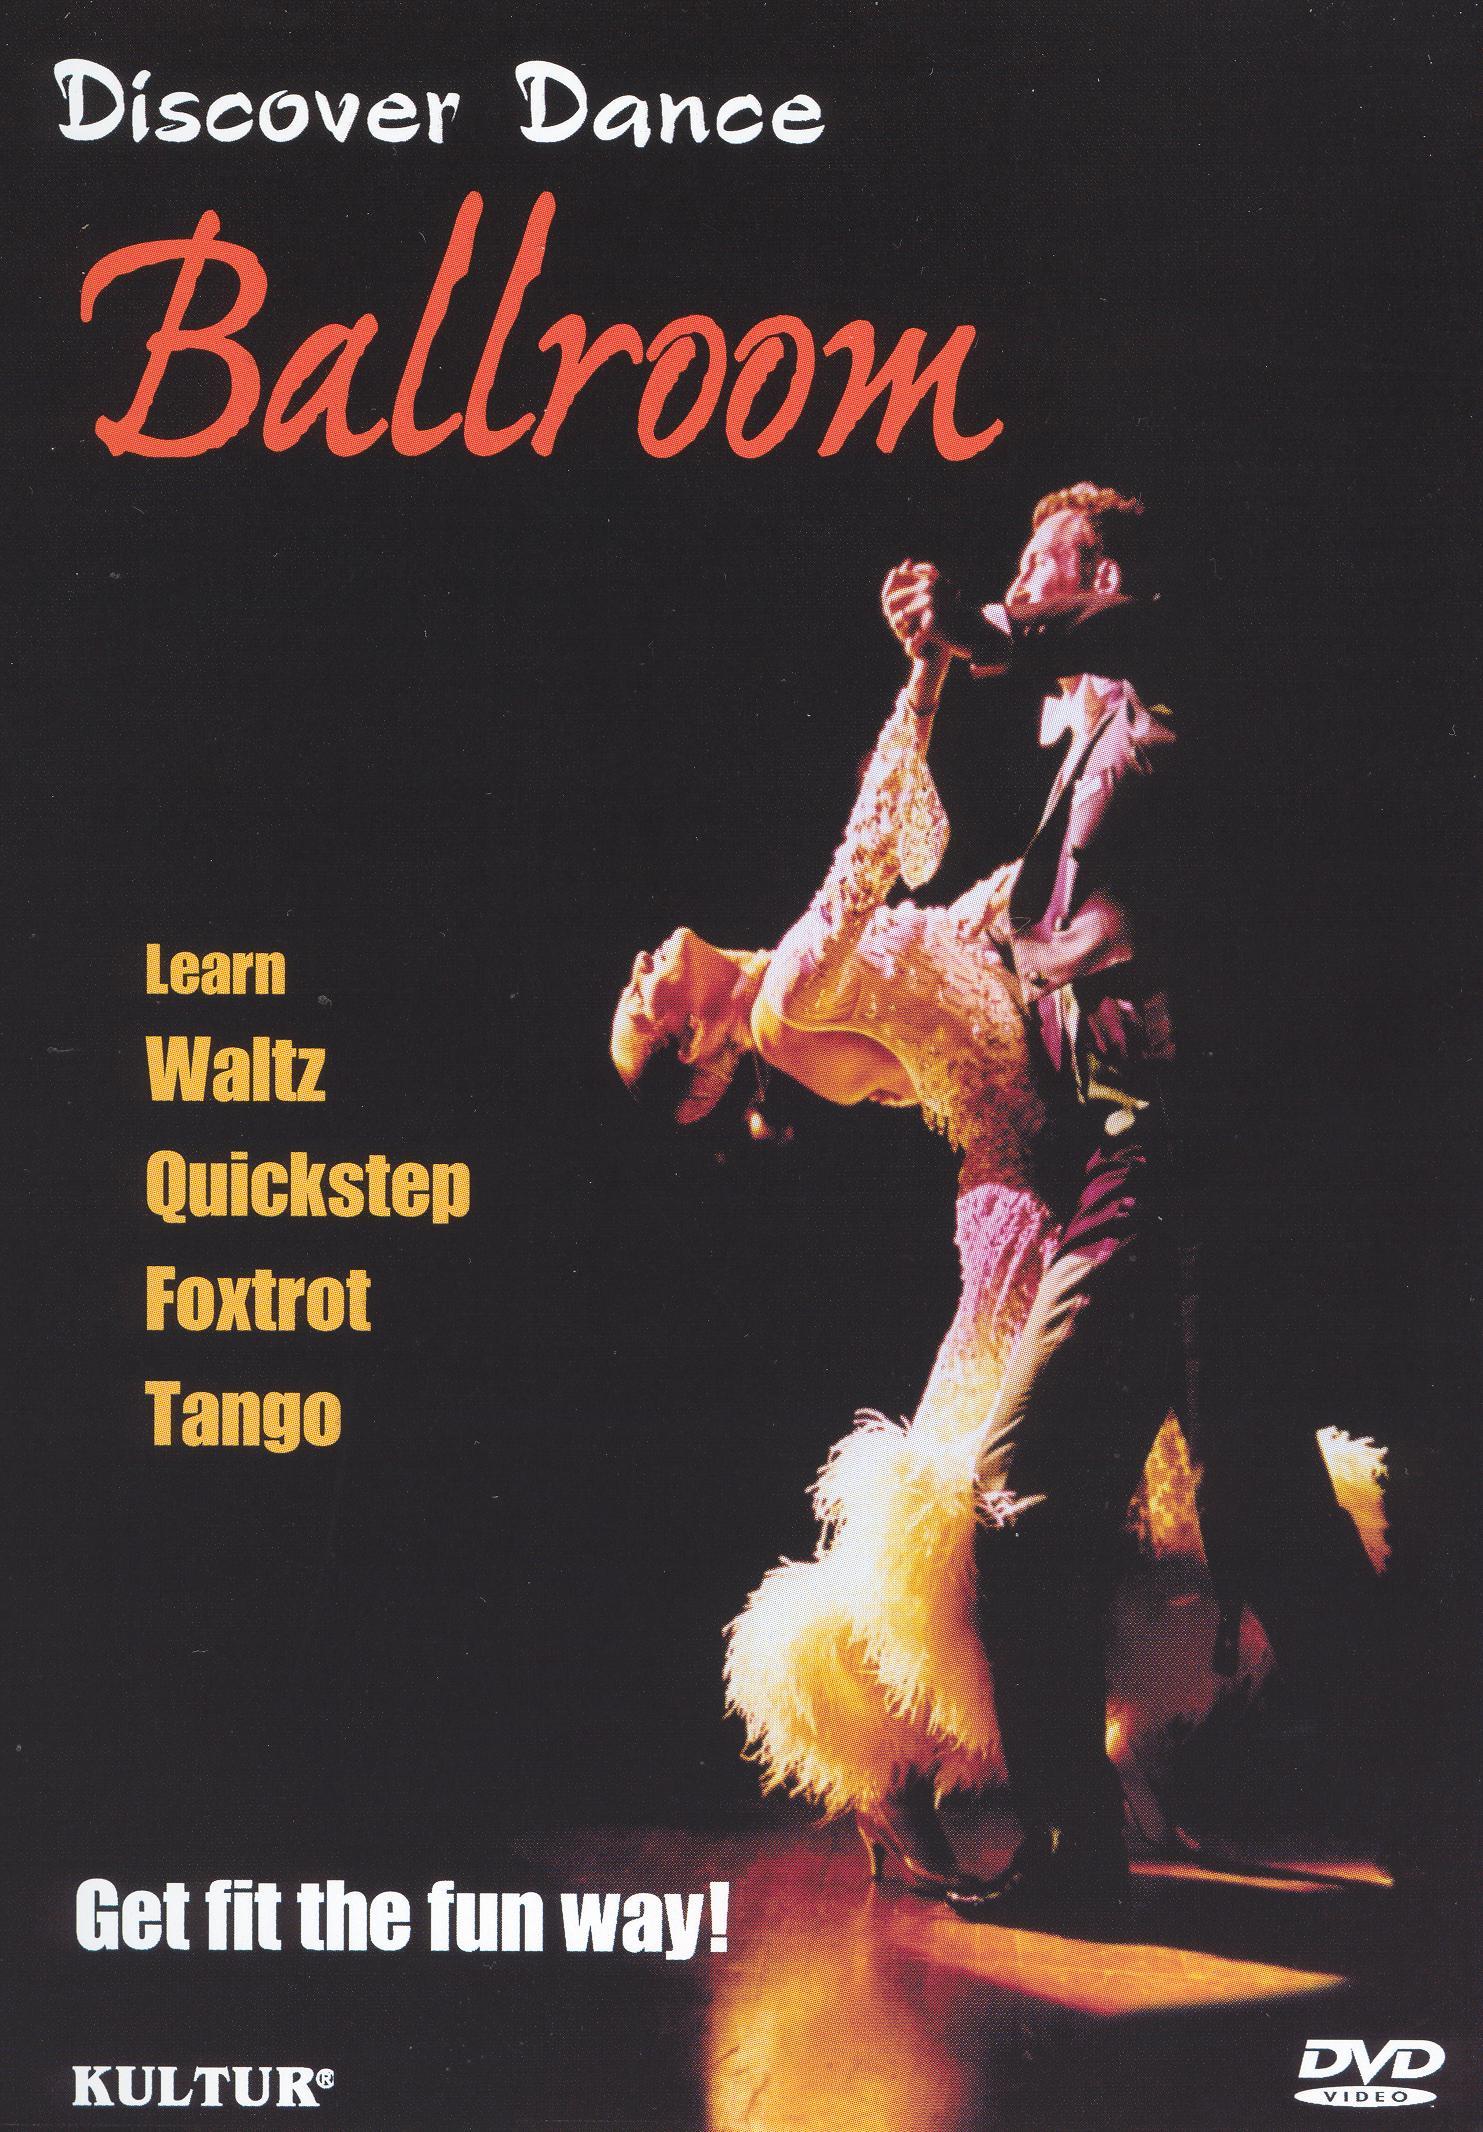 Discover Dance: Ballroom